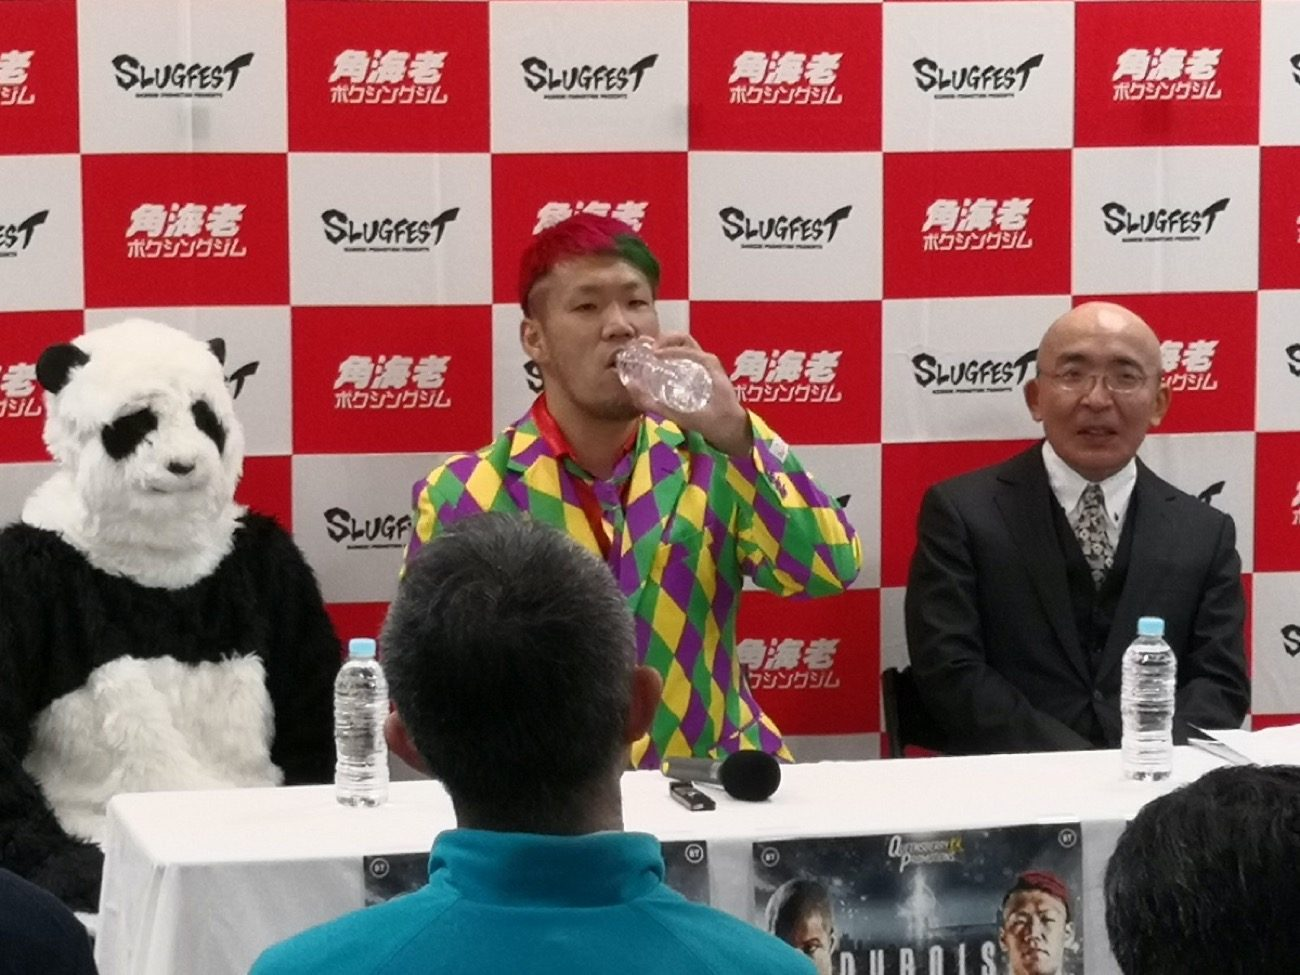 - Latest Daniel Dubois Dubois vs. Fujimoto Kyotaro Fujimoto